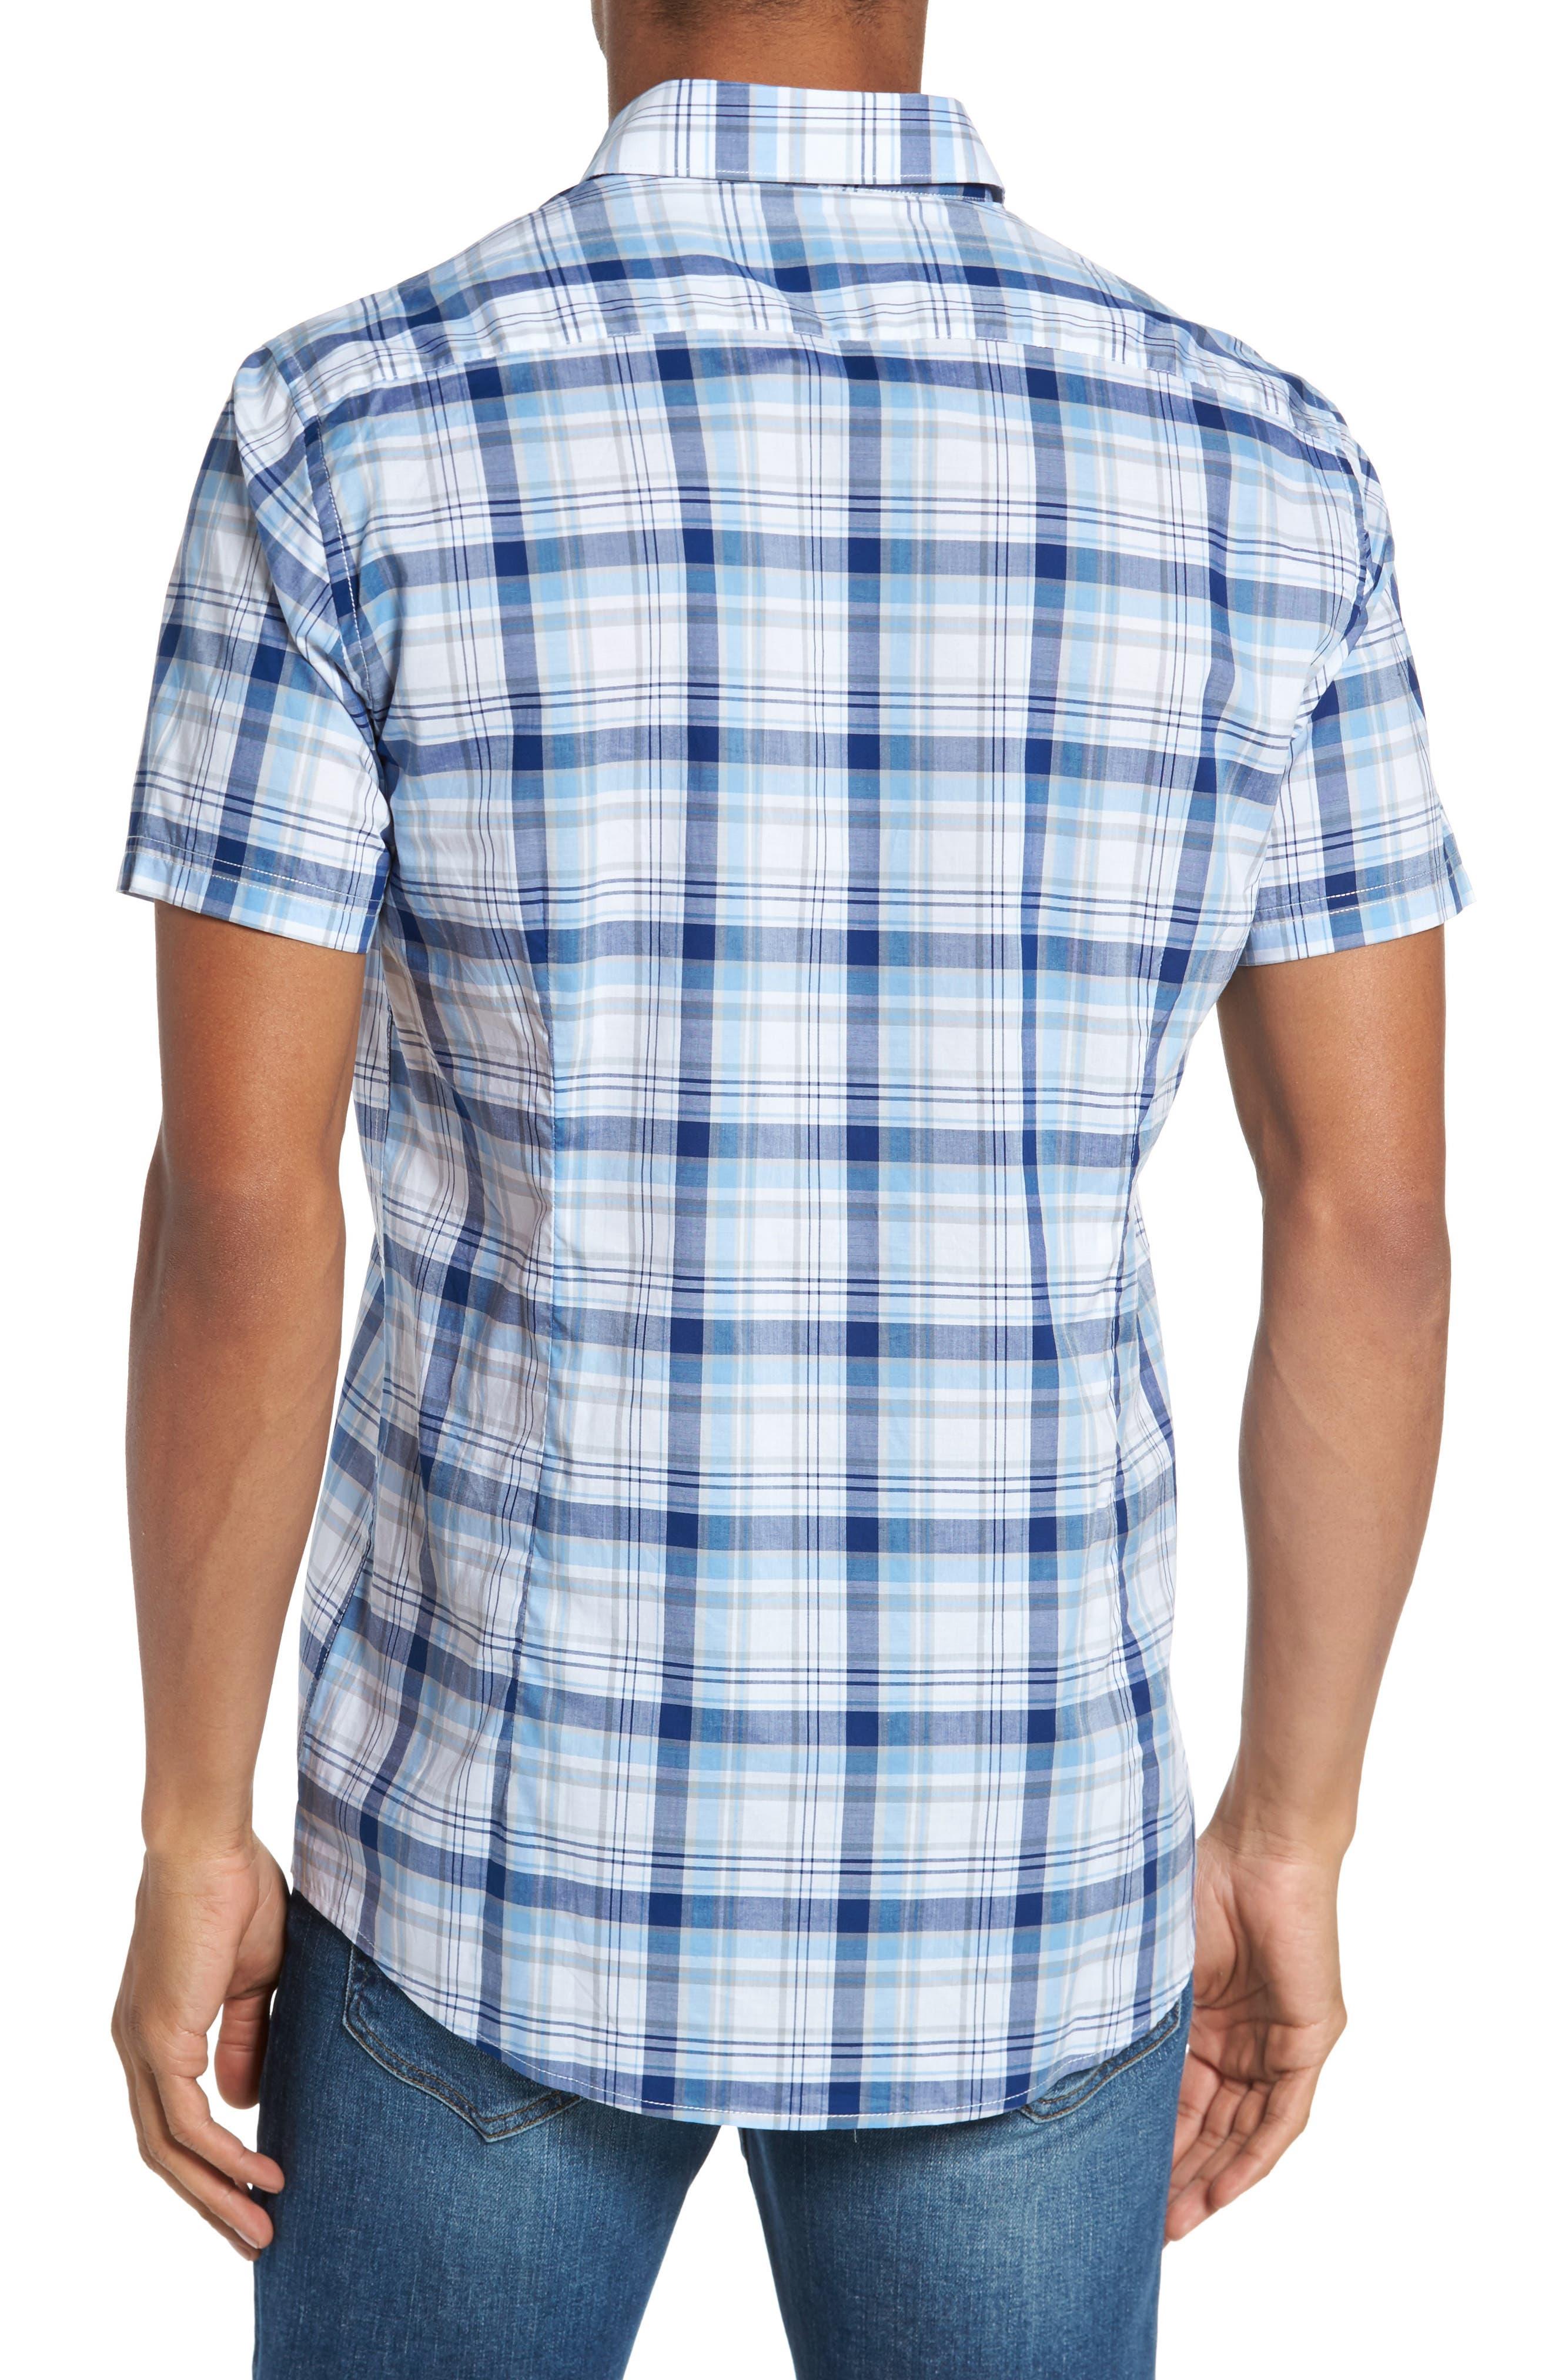 Gerald Tailored Fit Plaid Sport Shirt,                             Alternate thumbnail 2, color,                             450